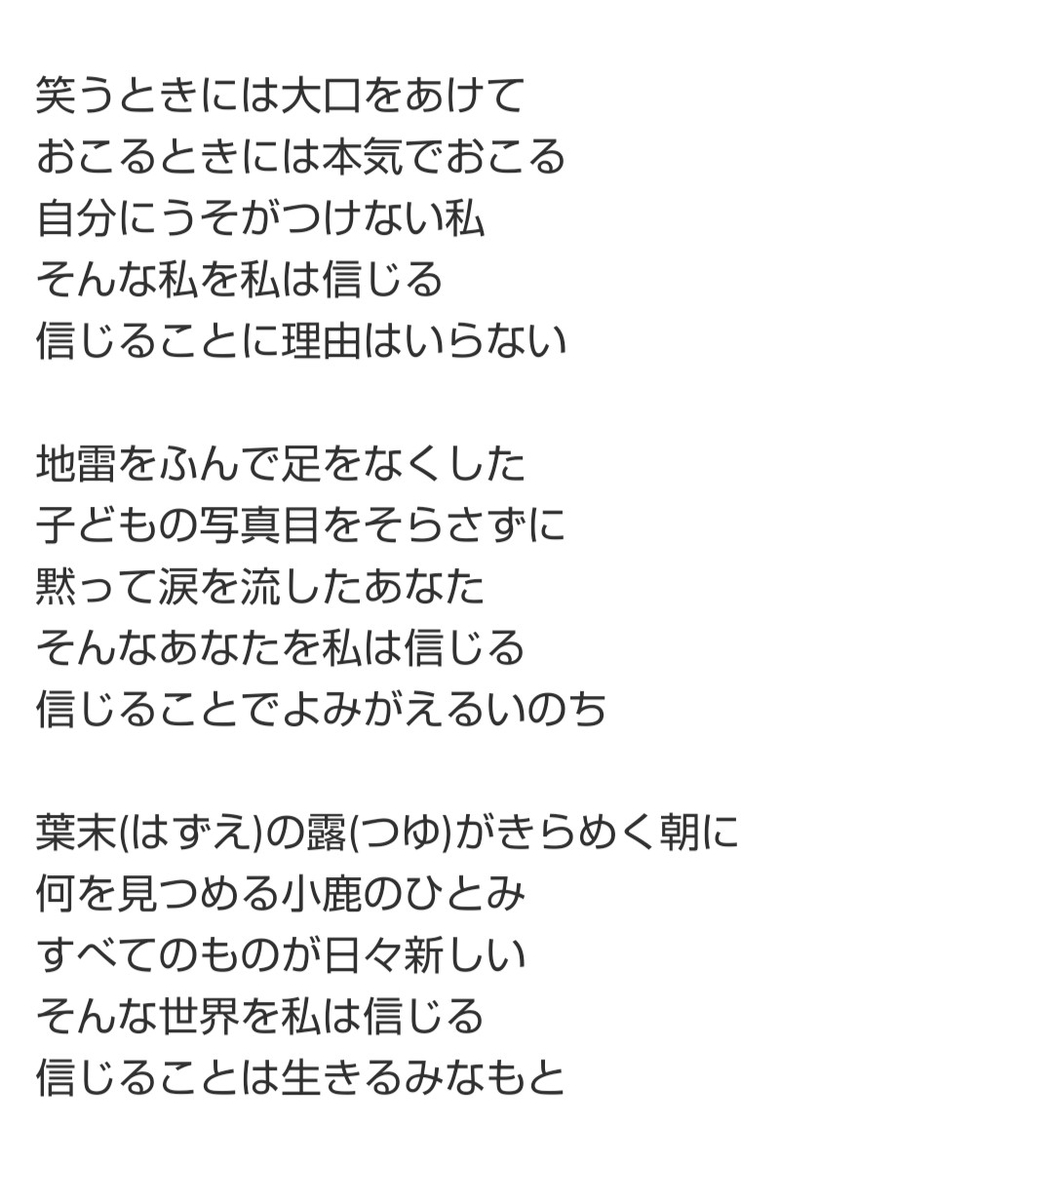 f:id:heitaku:20210417034451j:plain